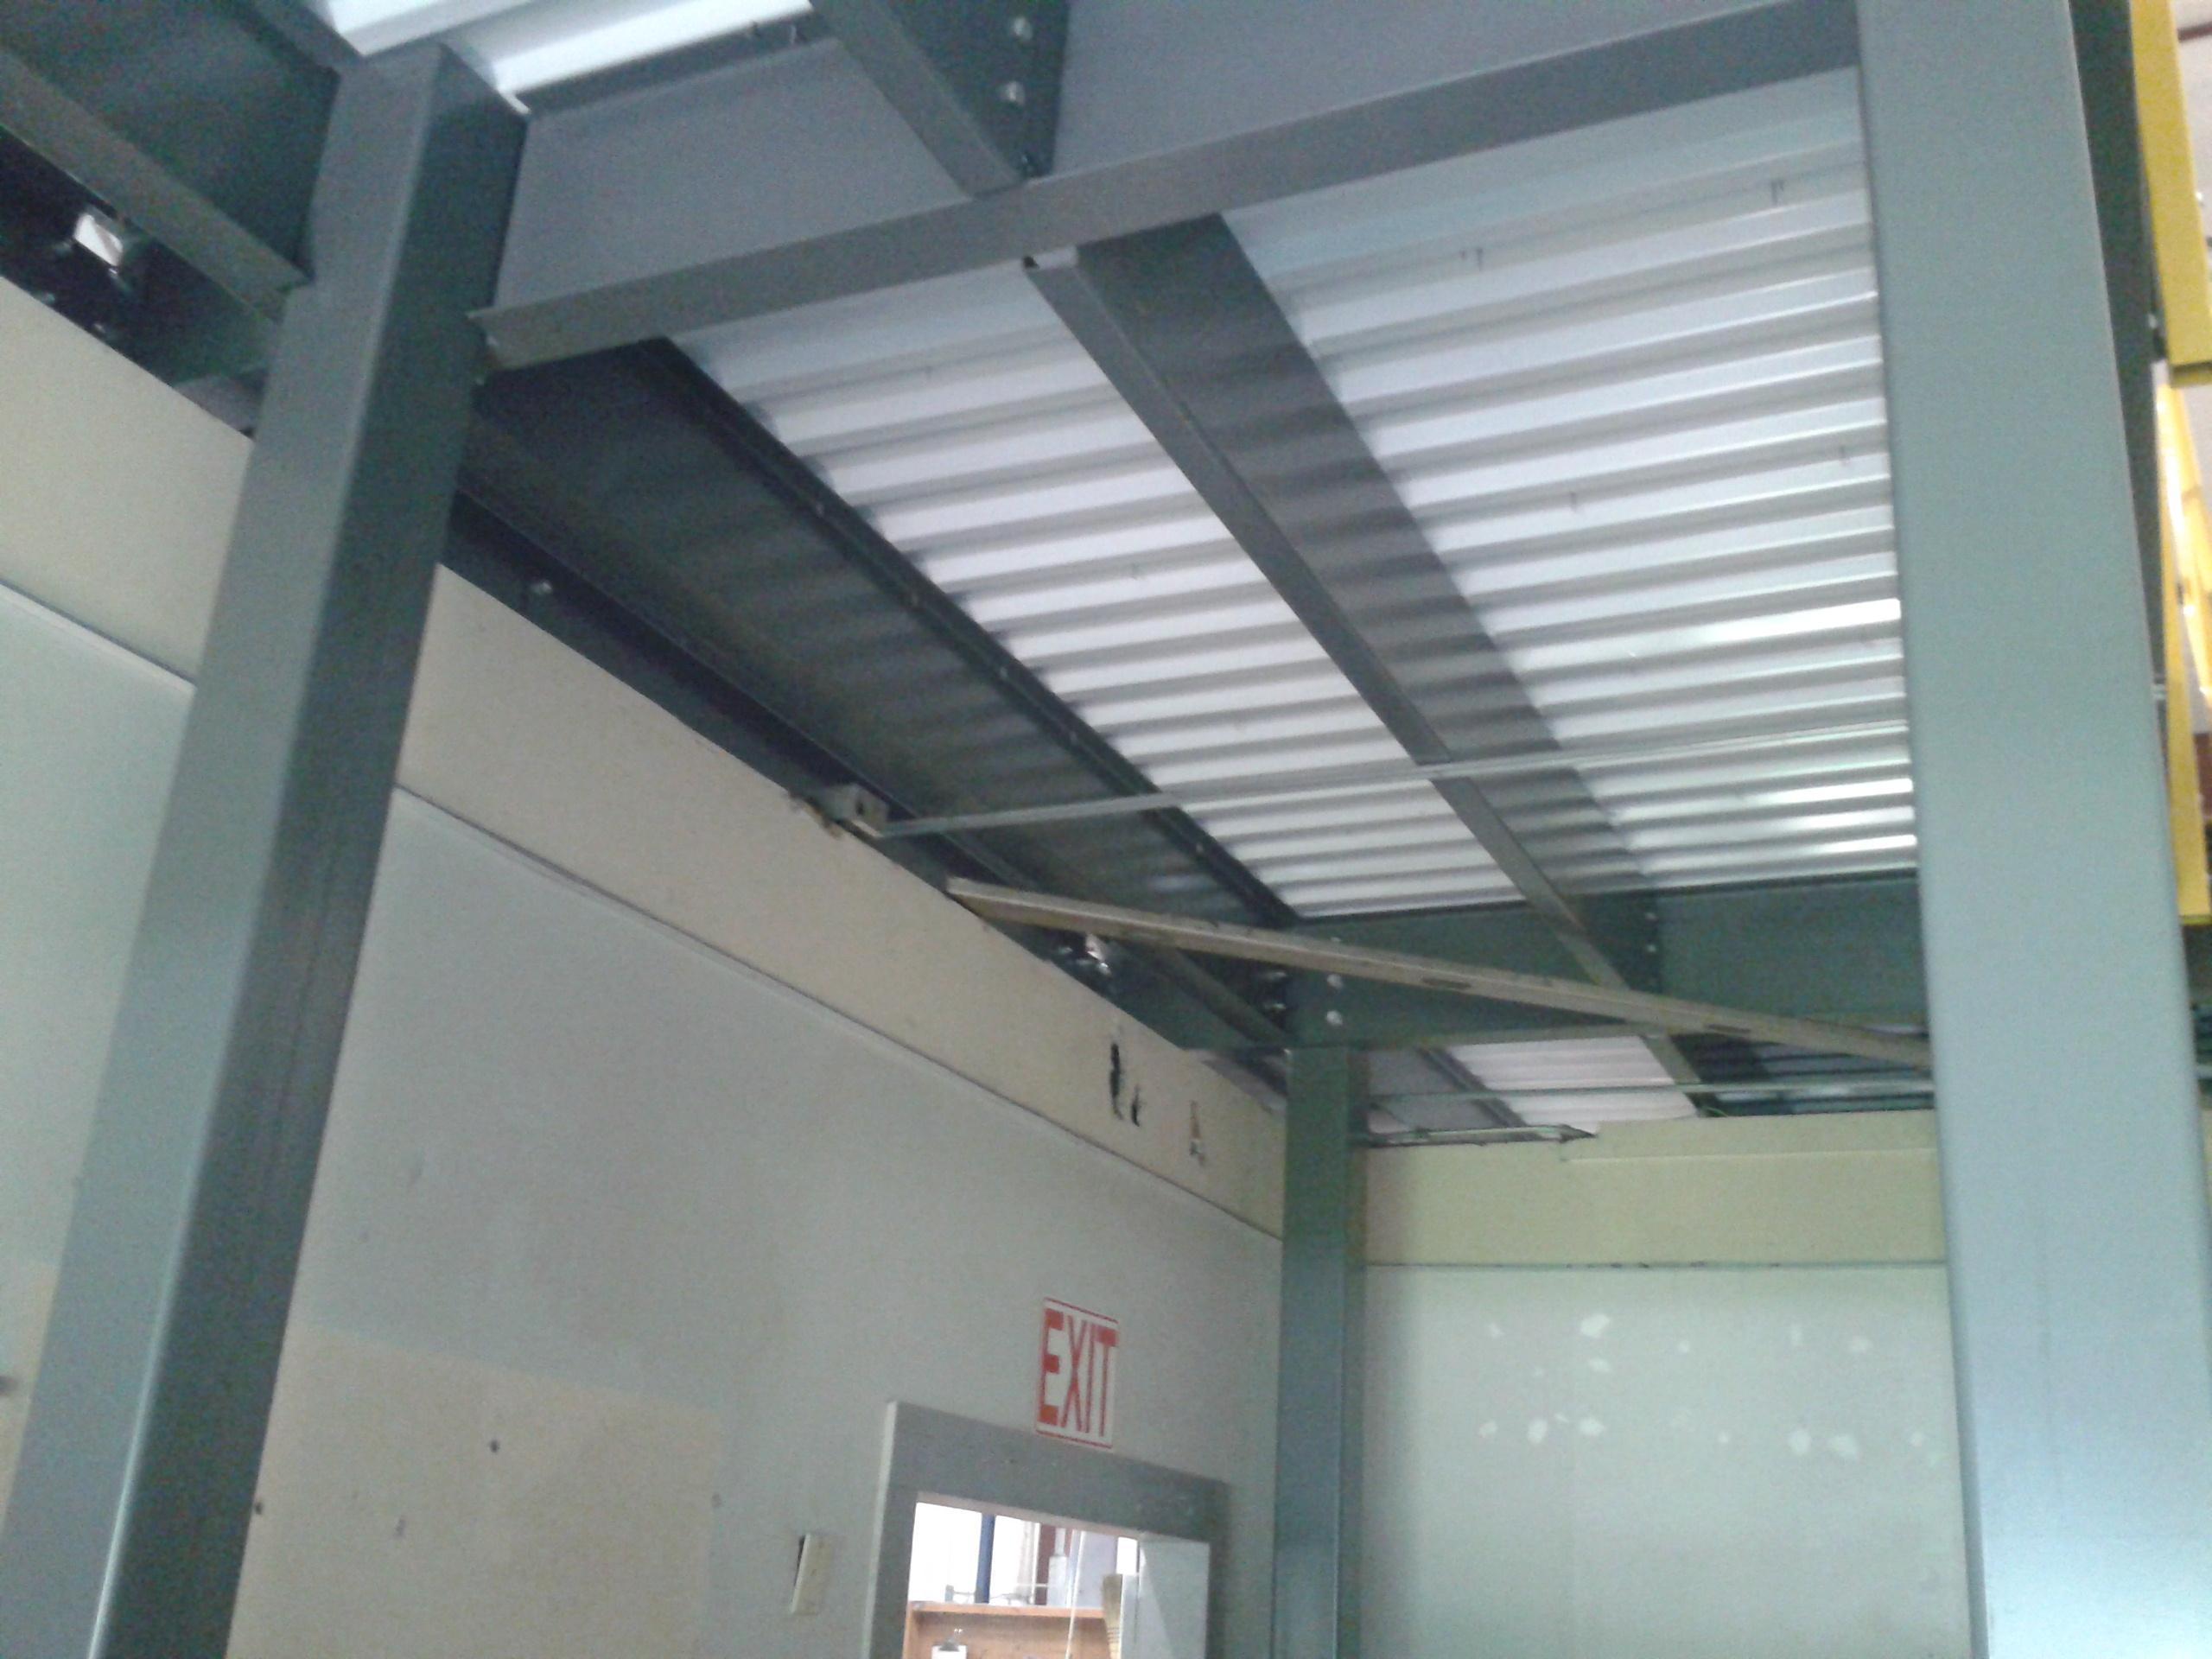 Mezzanine Deck Types: Corrugated Roof Deck with Resindek ...